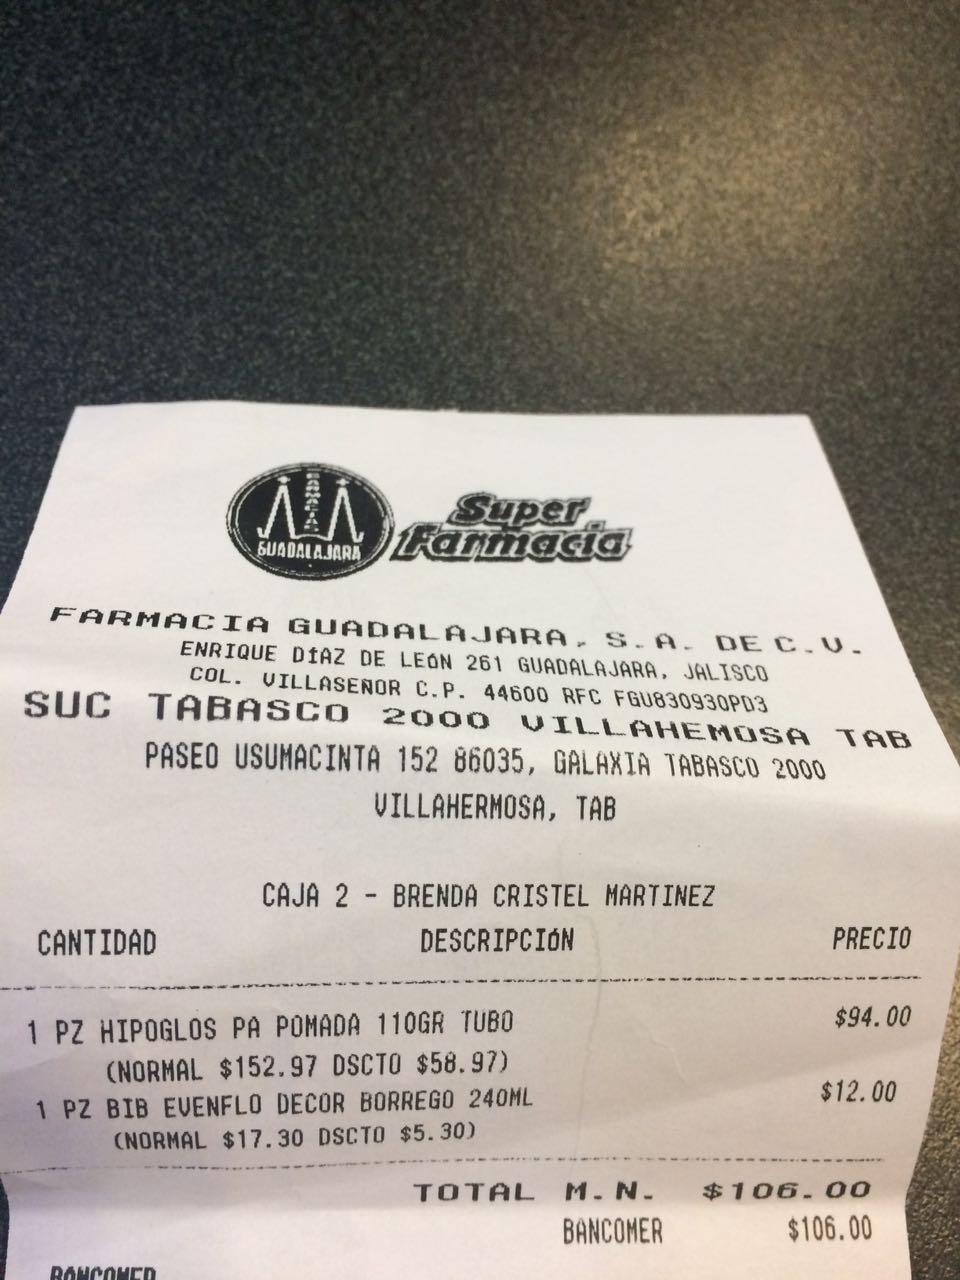 Farmacias Guadalajara: HIPOGLOSS TUBO GRANDE